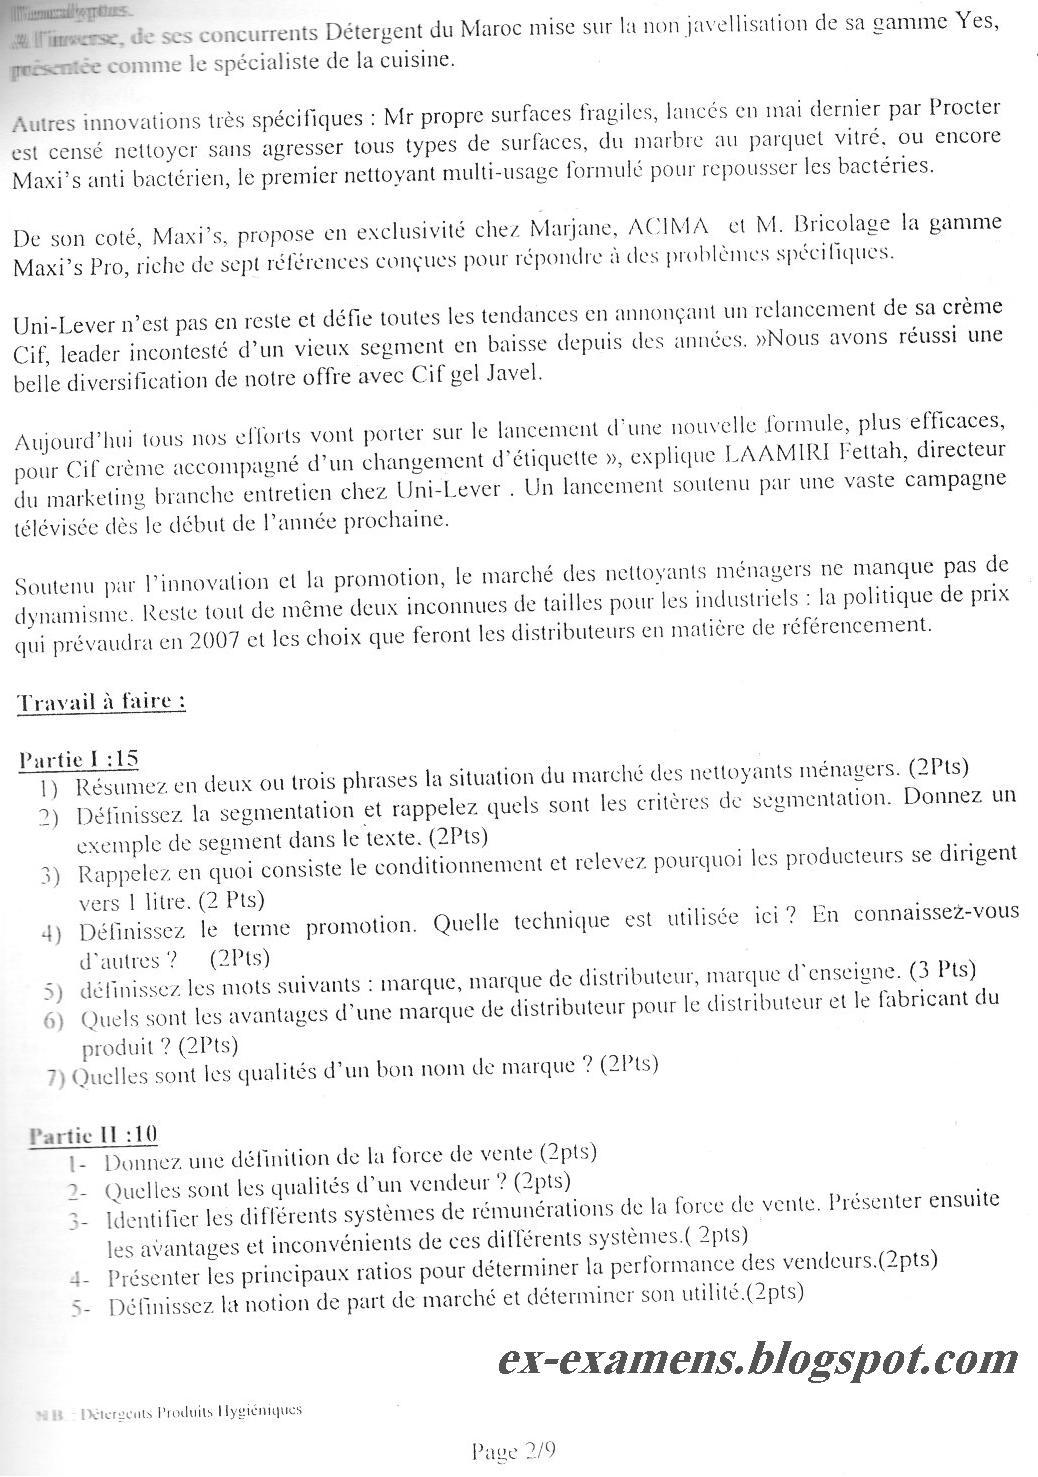 Examen de fin de formation pratique TSGE 2006 Variante 2 IMG_0121